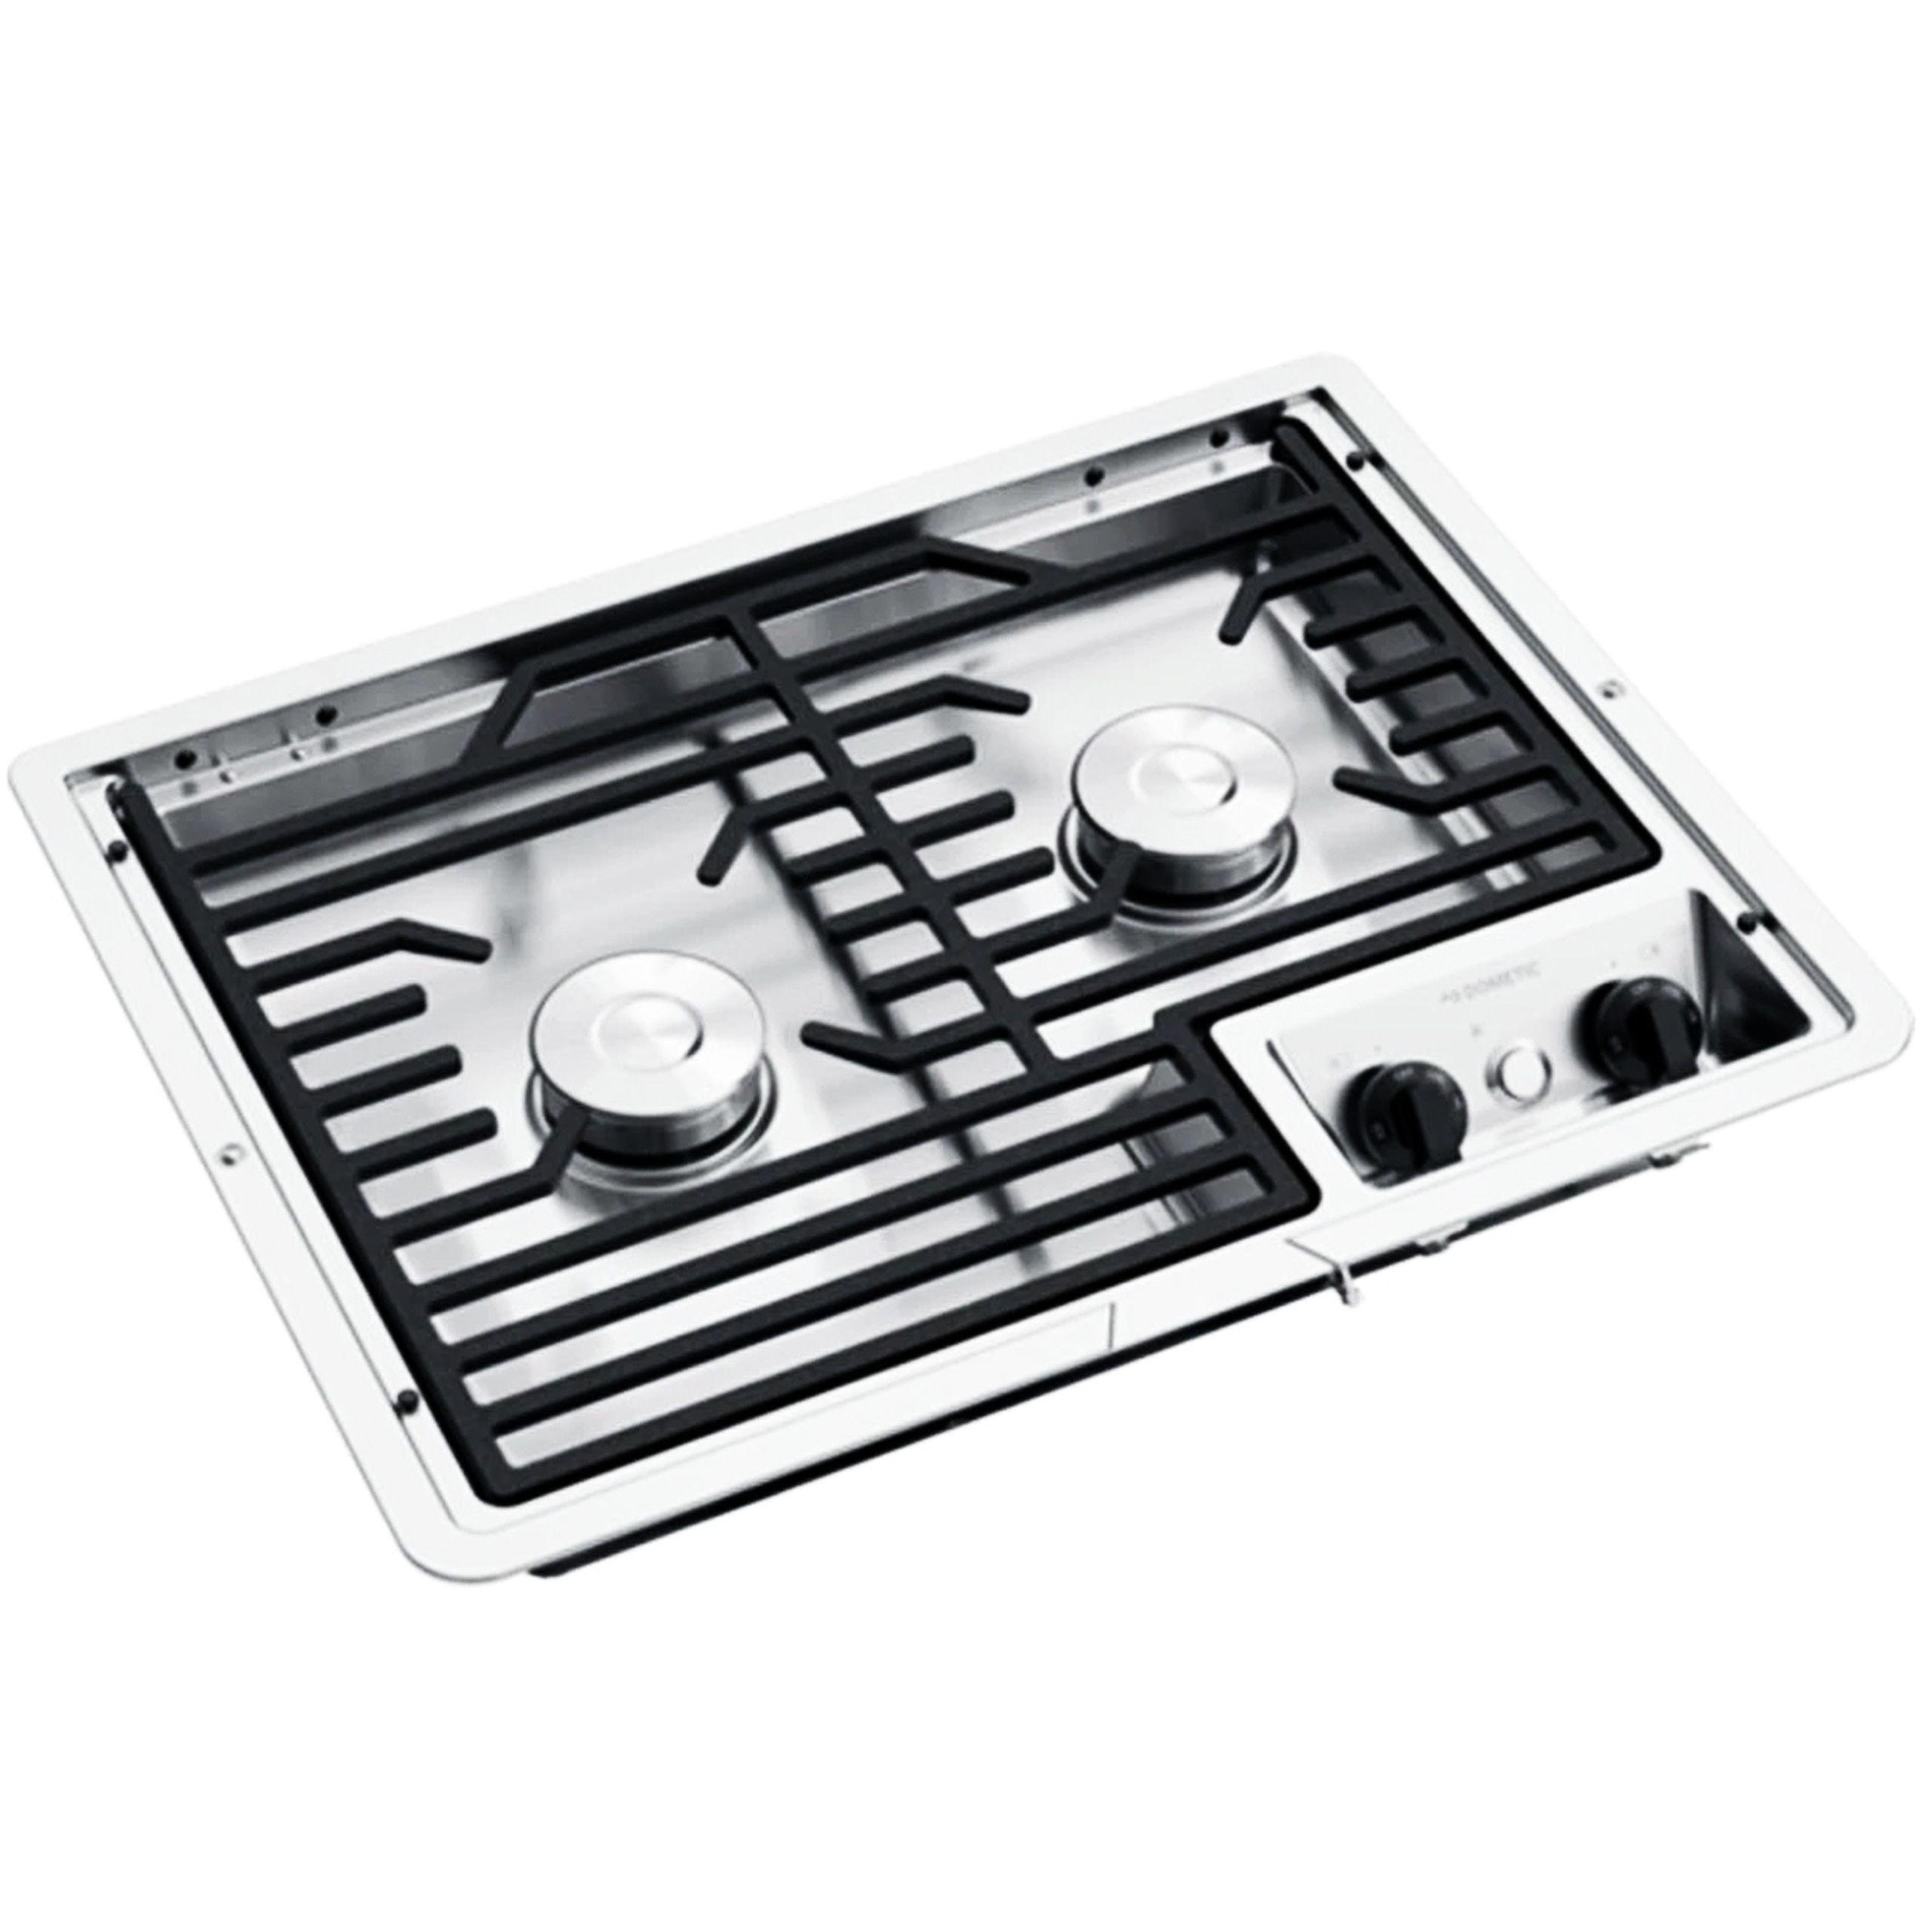 Dometic D21 Sec 50216 Rv 2 Burner Propane Cooktop Stainless